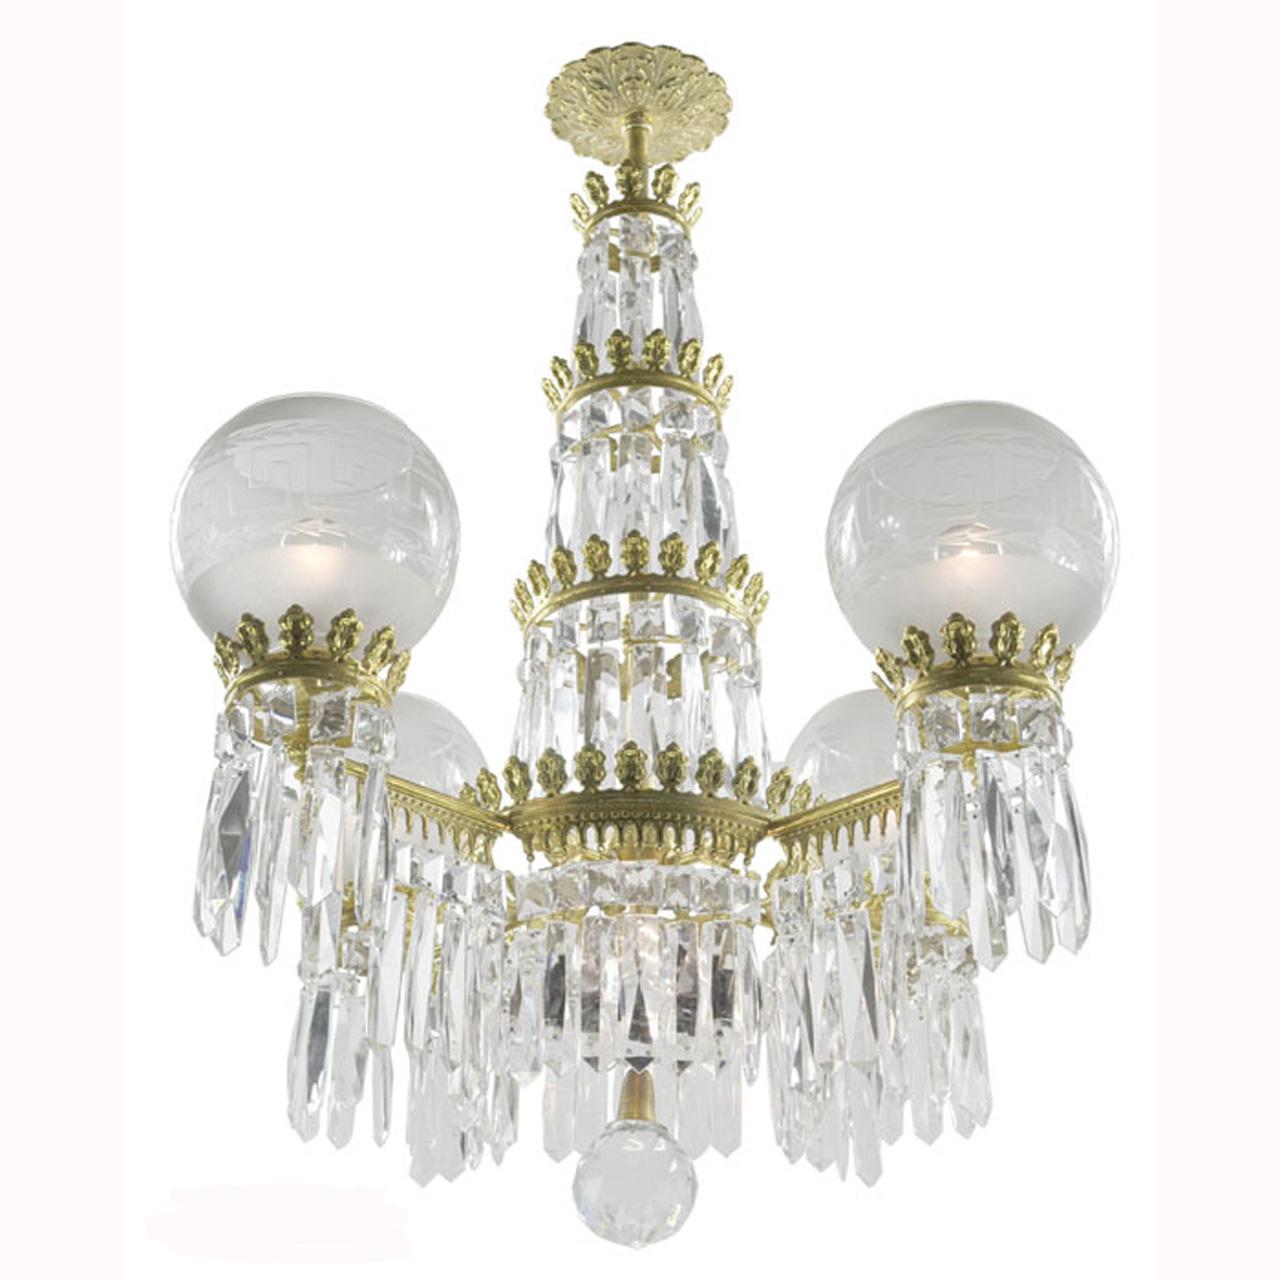 Crystal Chandelier Sale: Antique Original Crystal Gasolier Style Ceiling Chandelier